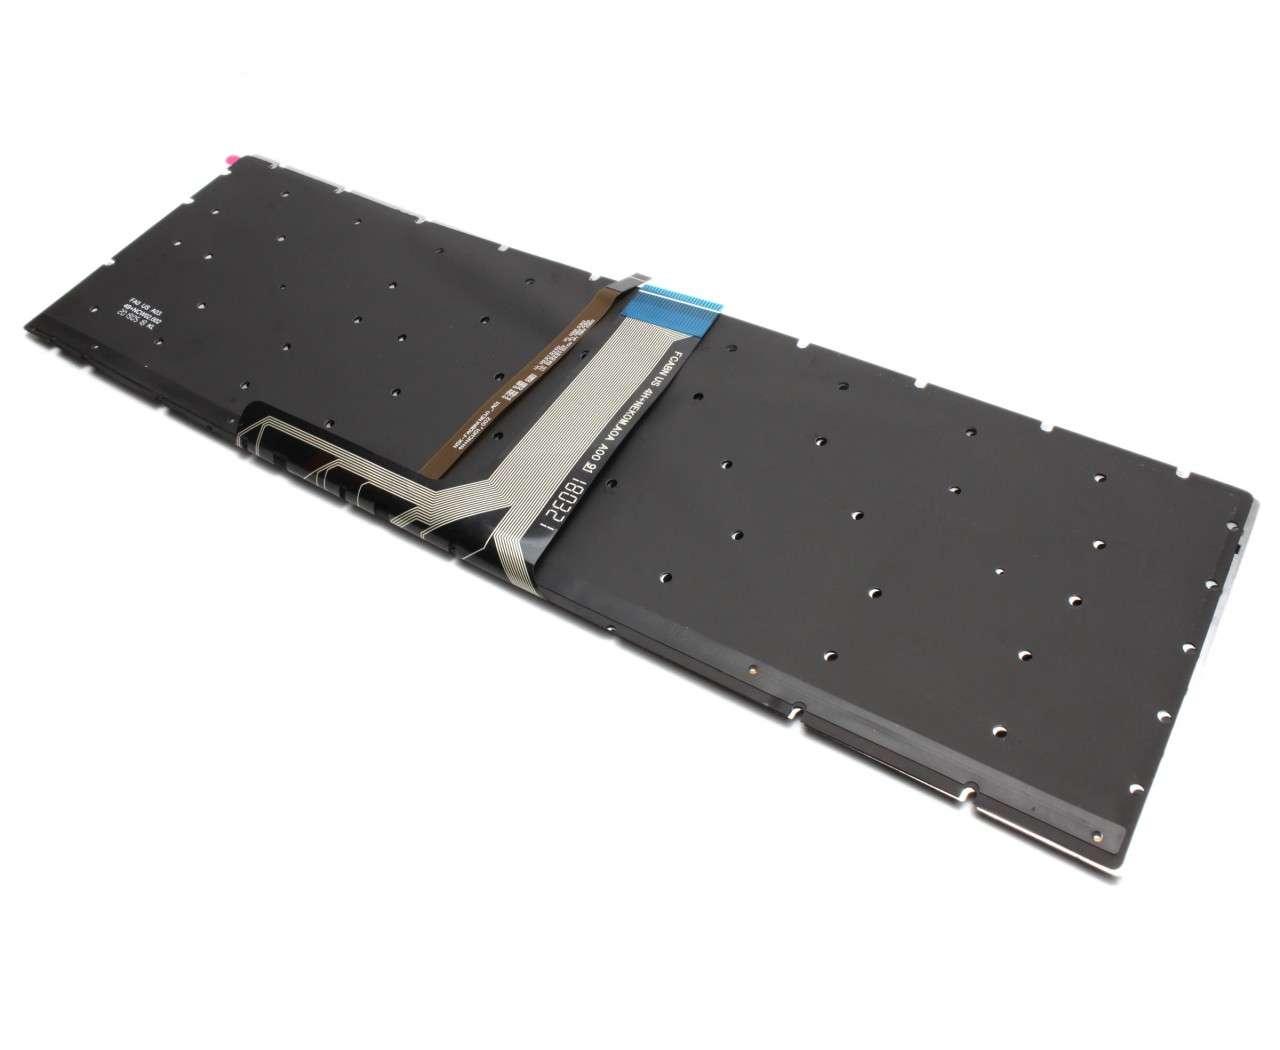 Tastatura MSI GE73 Raider 8RE iluminata layout US fara rama enter mic imagine powerlaptop.ro 2021